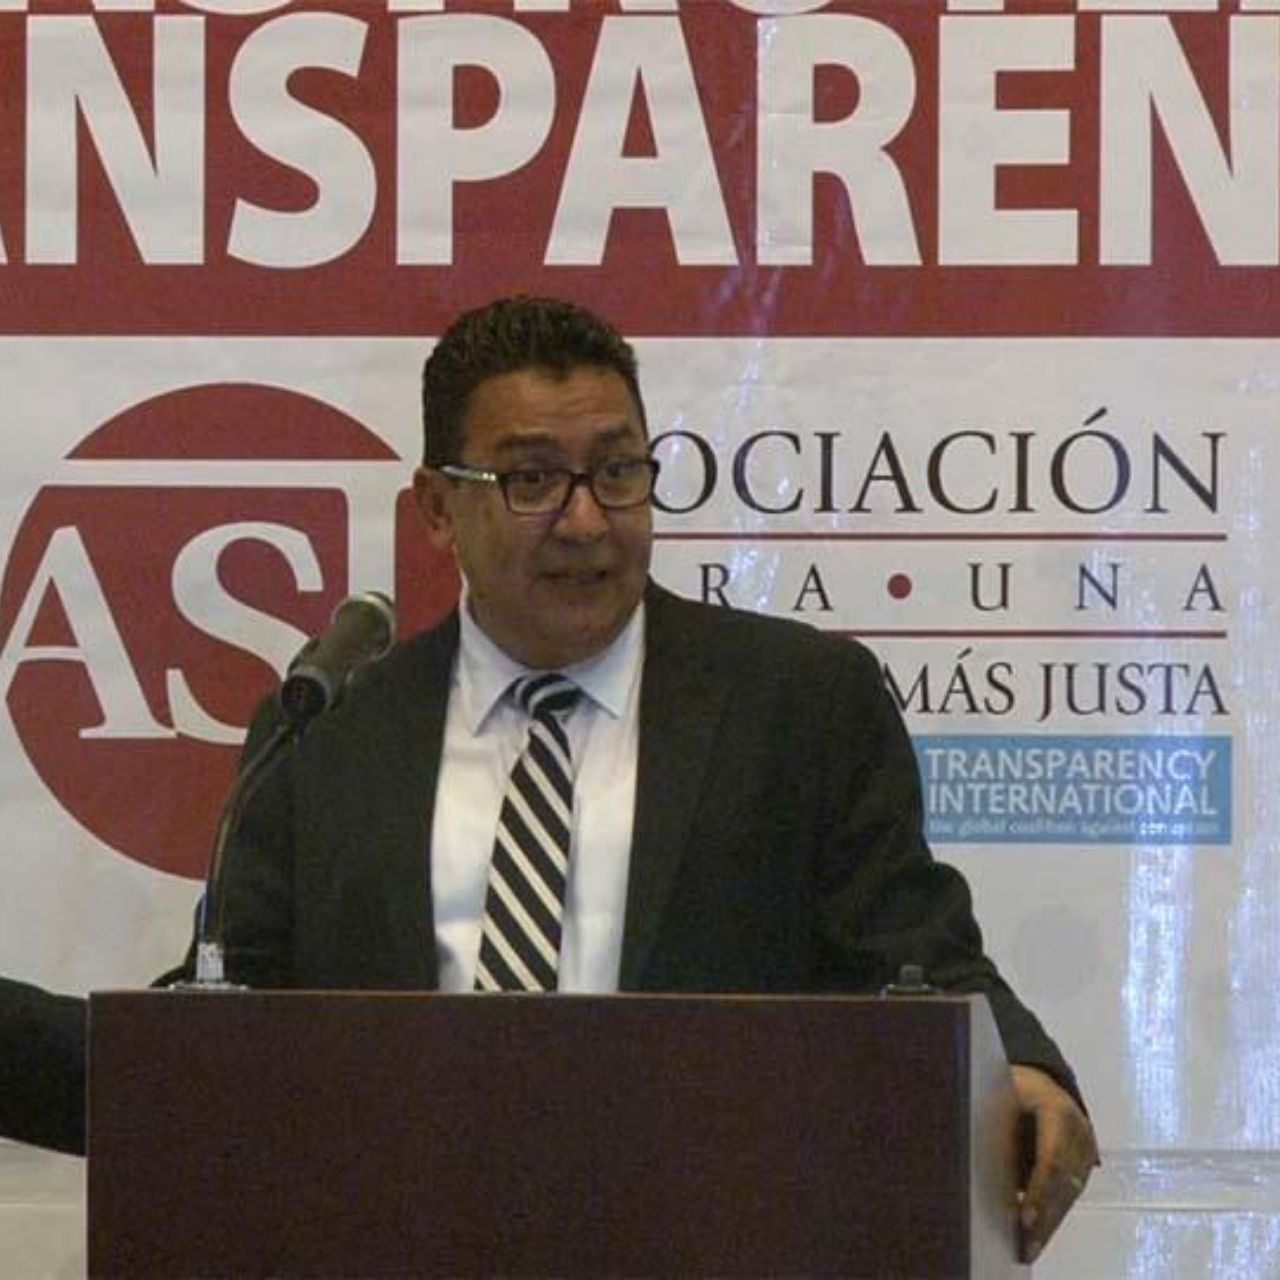 Auditoría de ASJ revela más compras sobrevaloradas por Invest-H